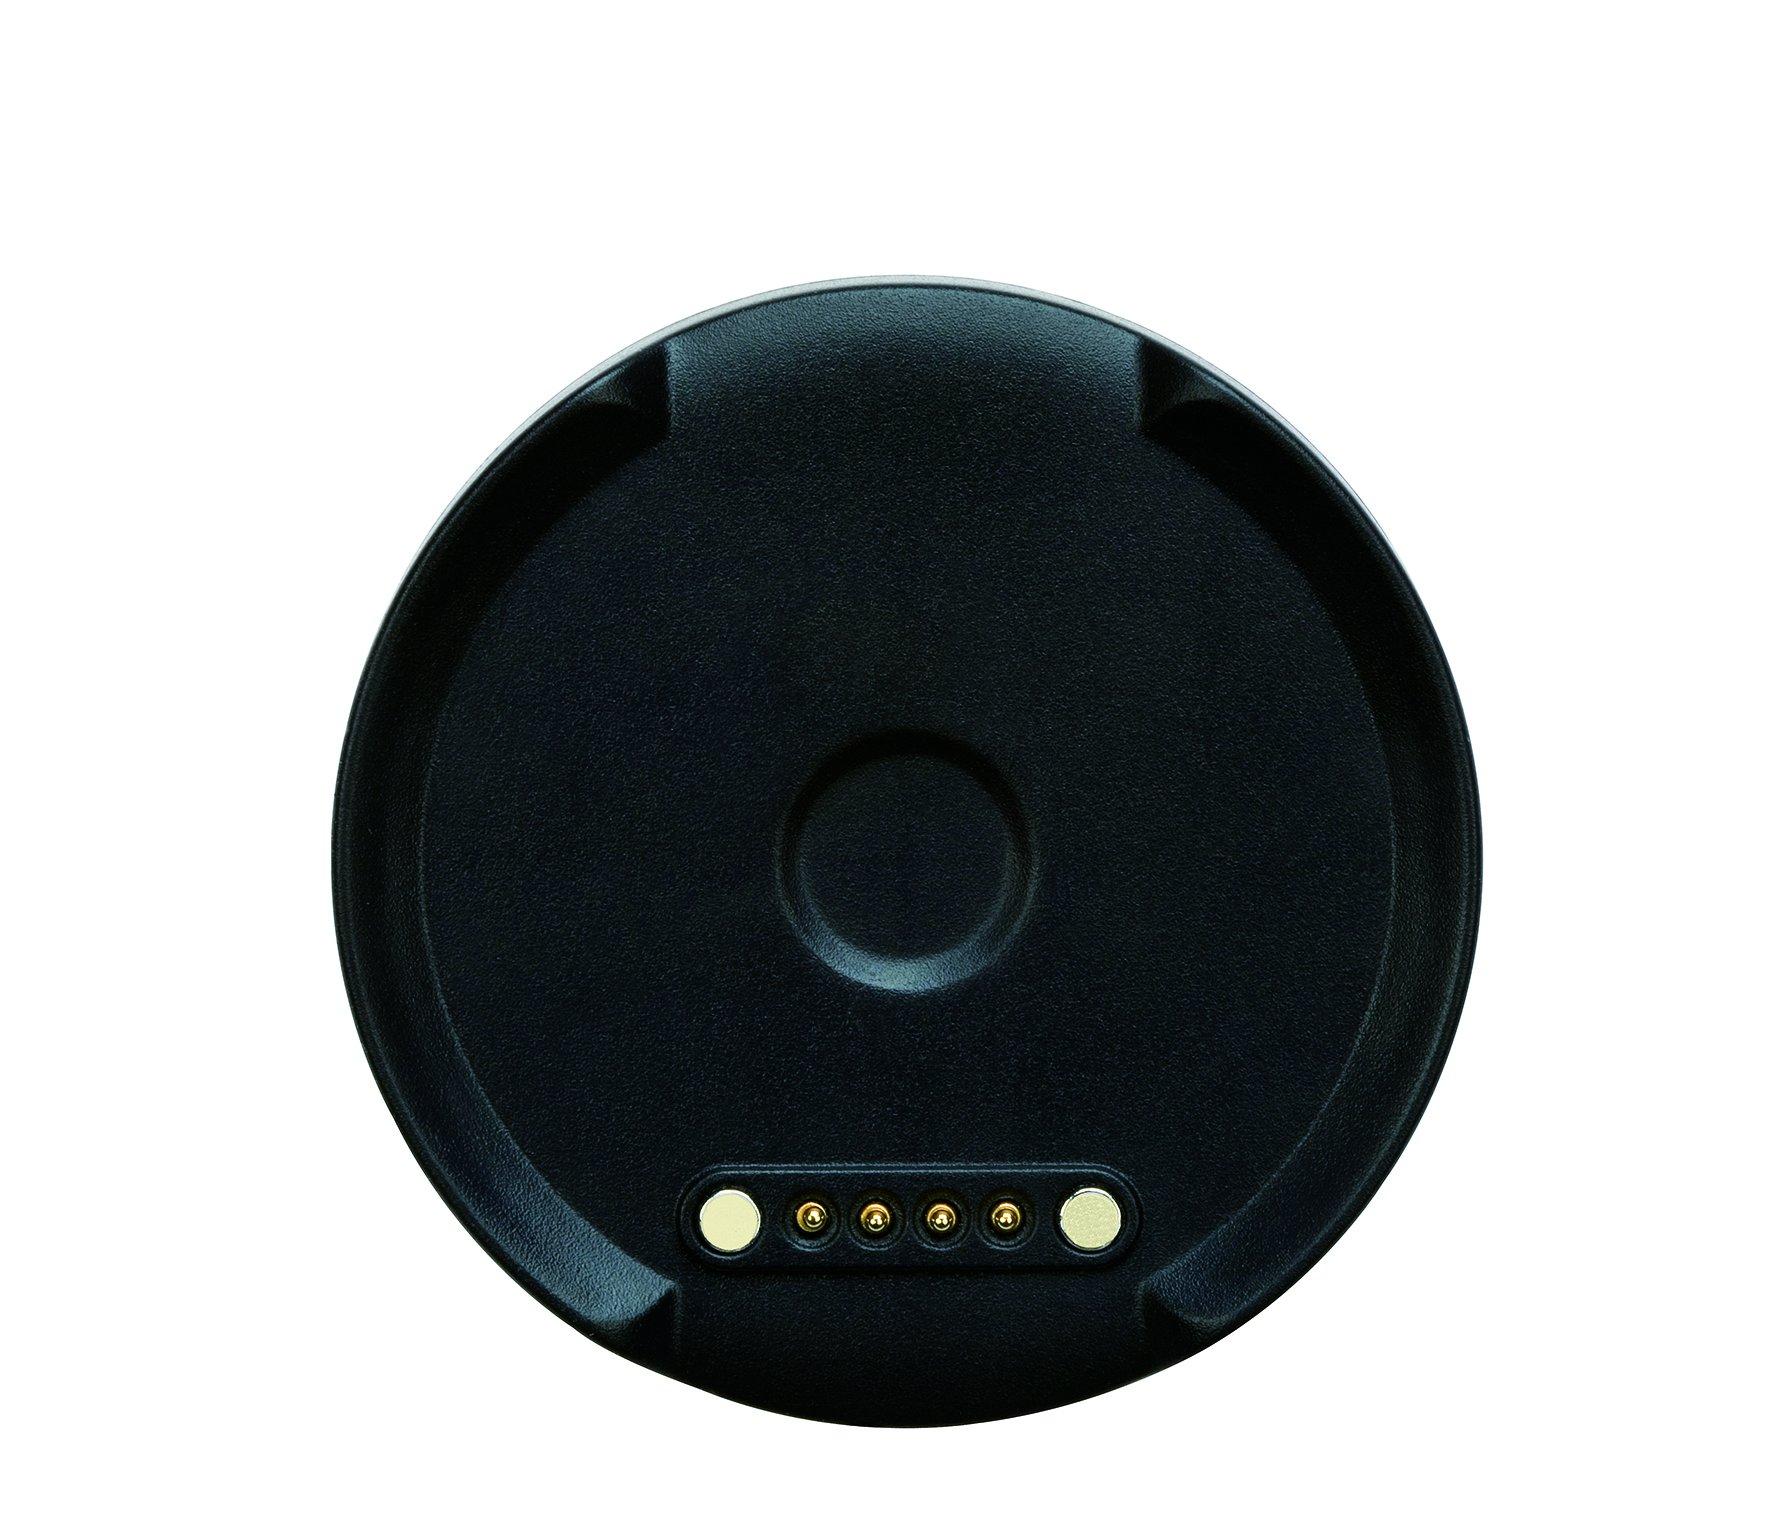 GolfBuddy WTX Smart Golf GPS Watch, Black by GolfBuddy (Image #9)